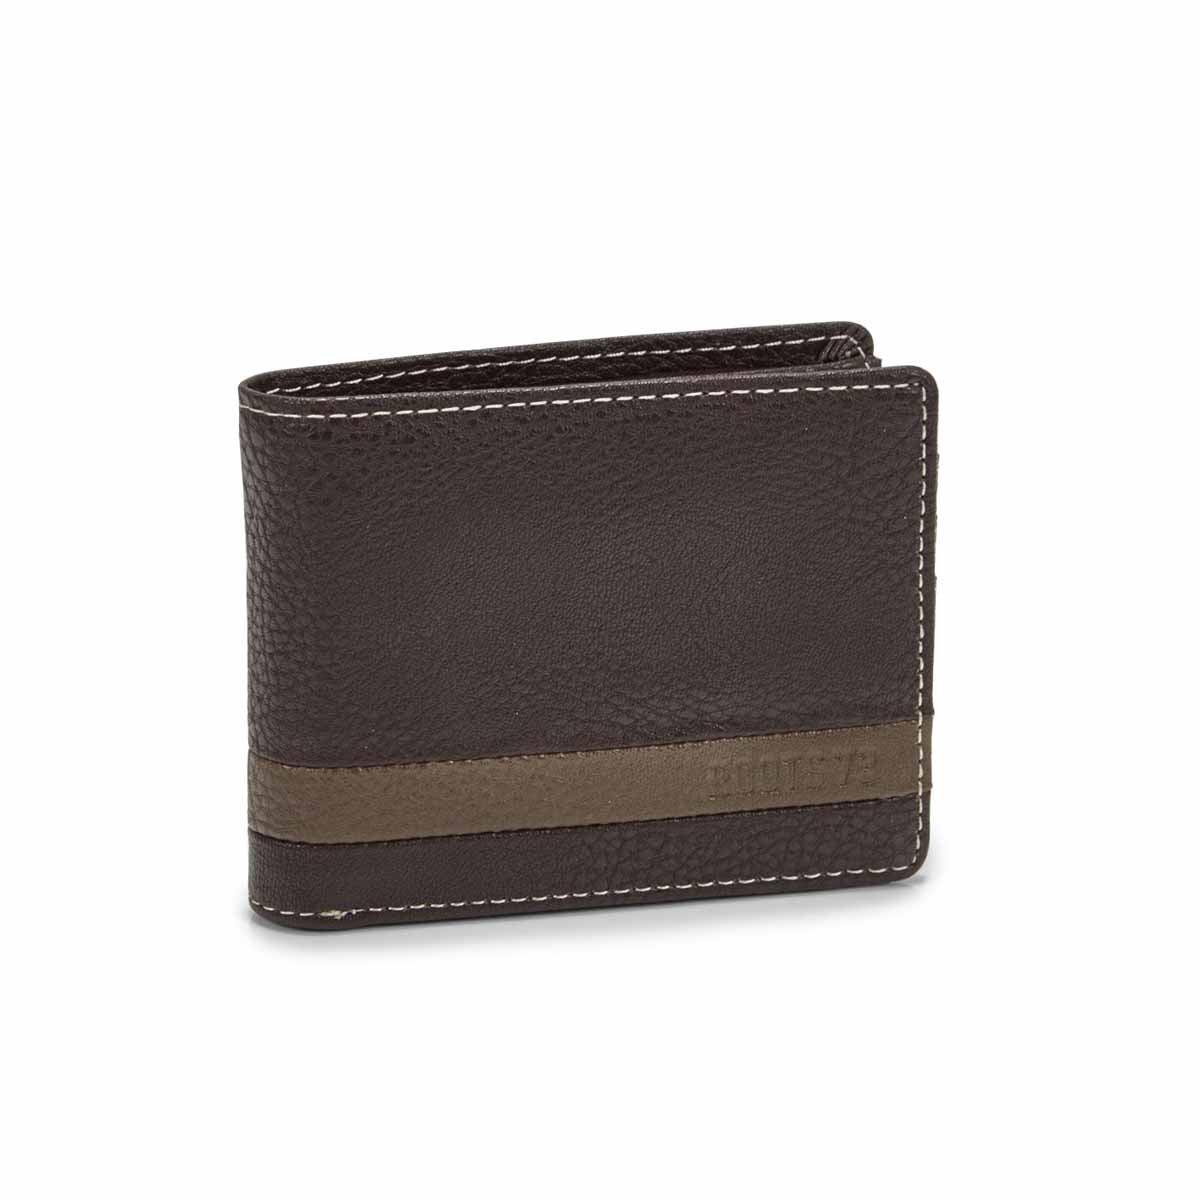 Men's TRAIL brown slimfold wallet